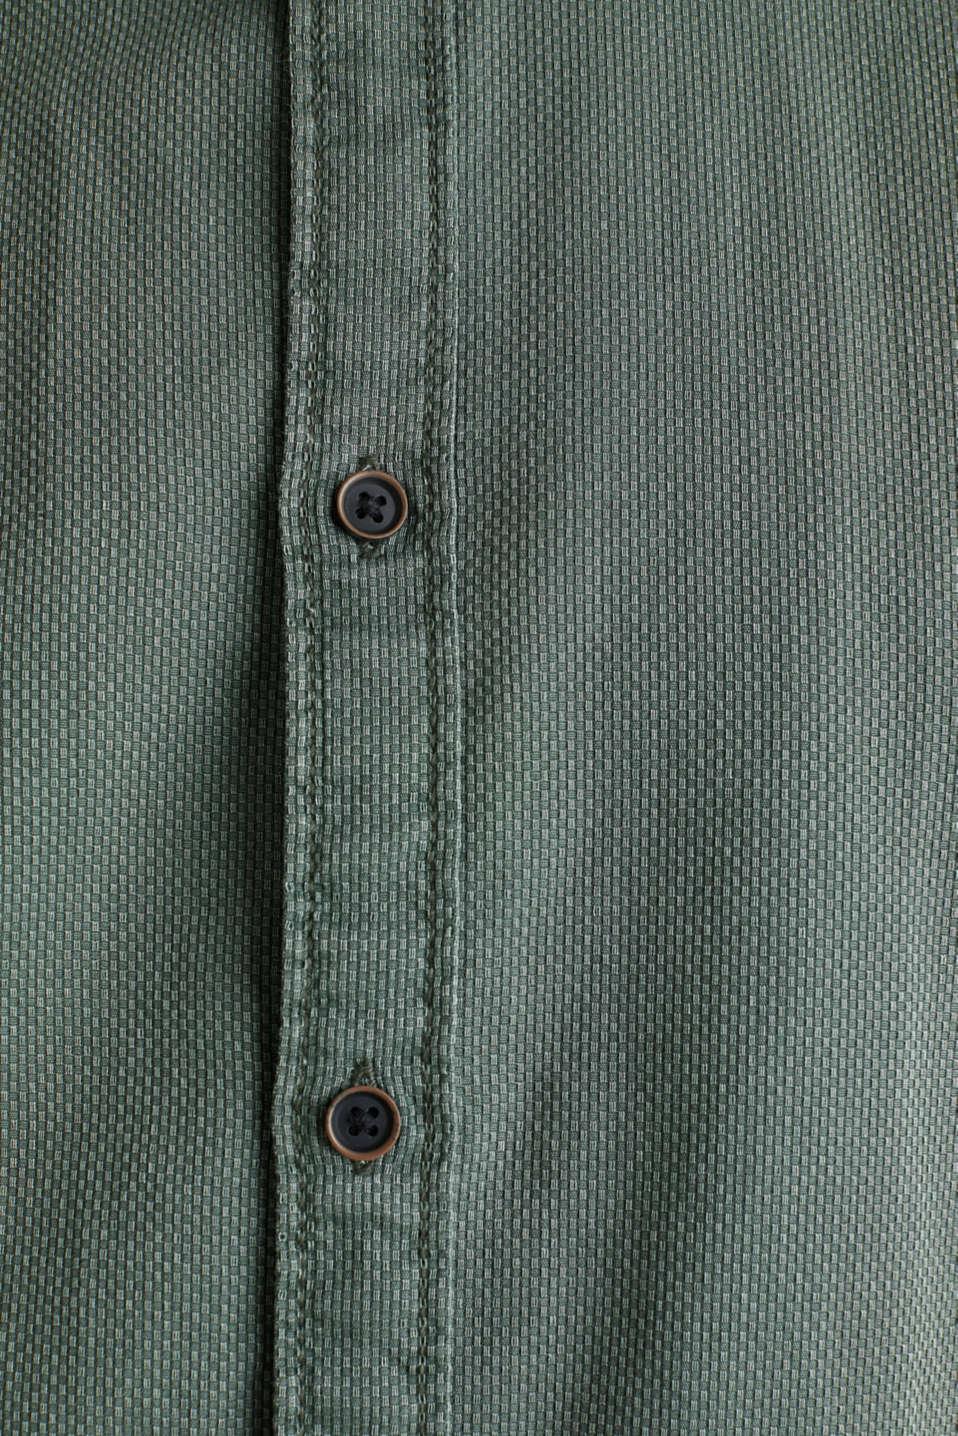 Shirts woven Slim fit, KHAKI GREEN 5, detail image number 4